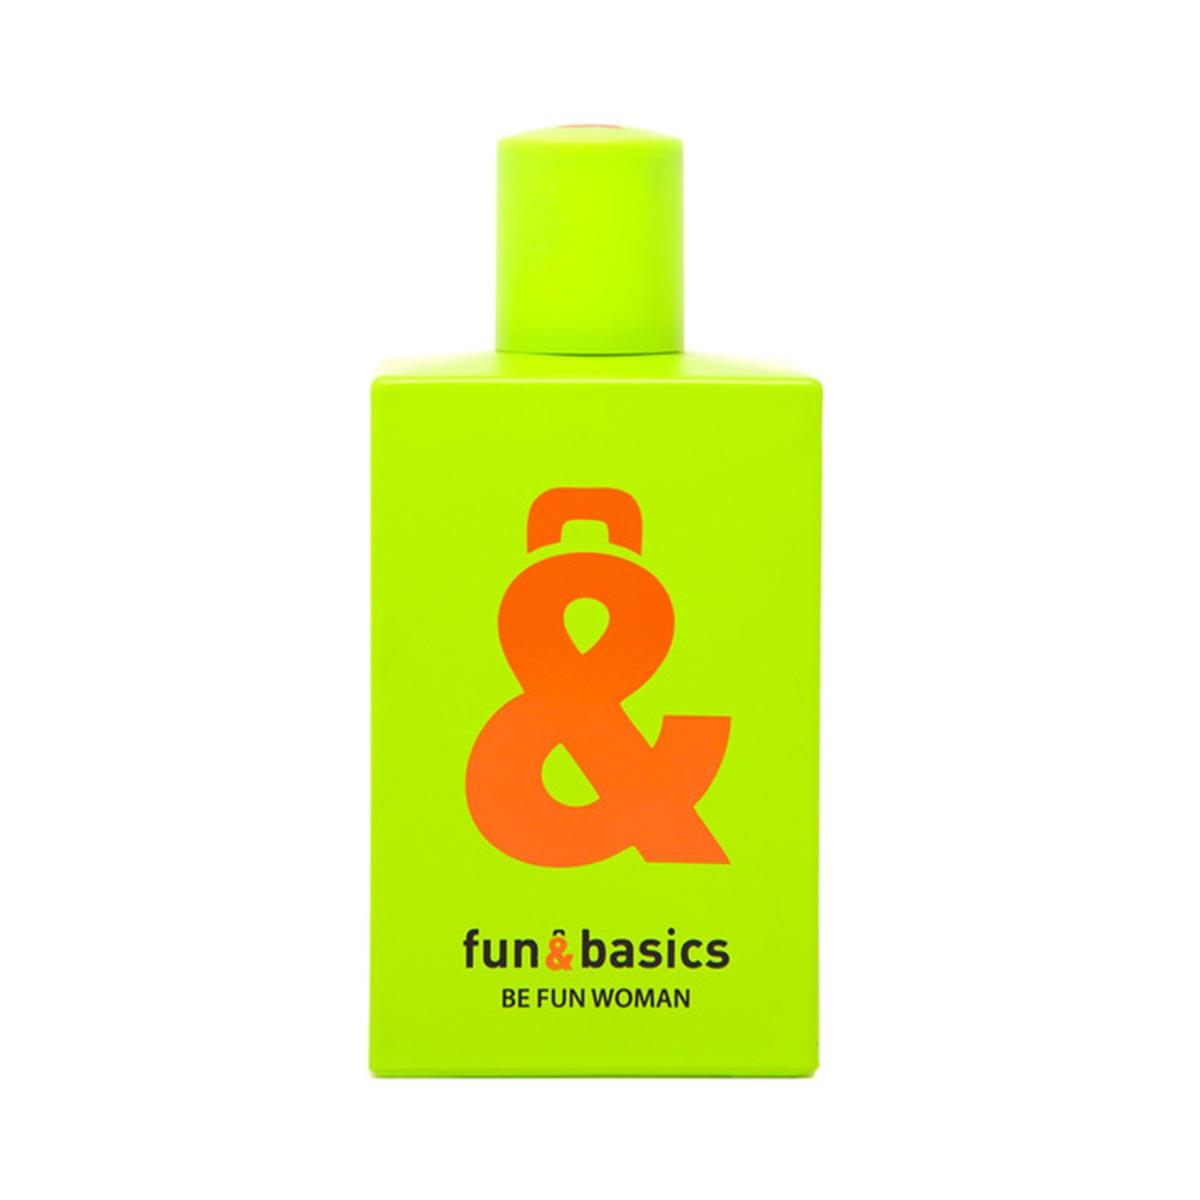 Fun basics be fun woman eau de toilette 100ml vaporizador